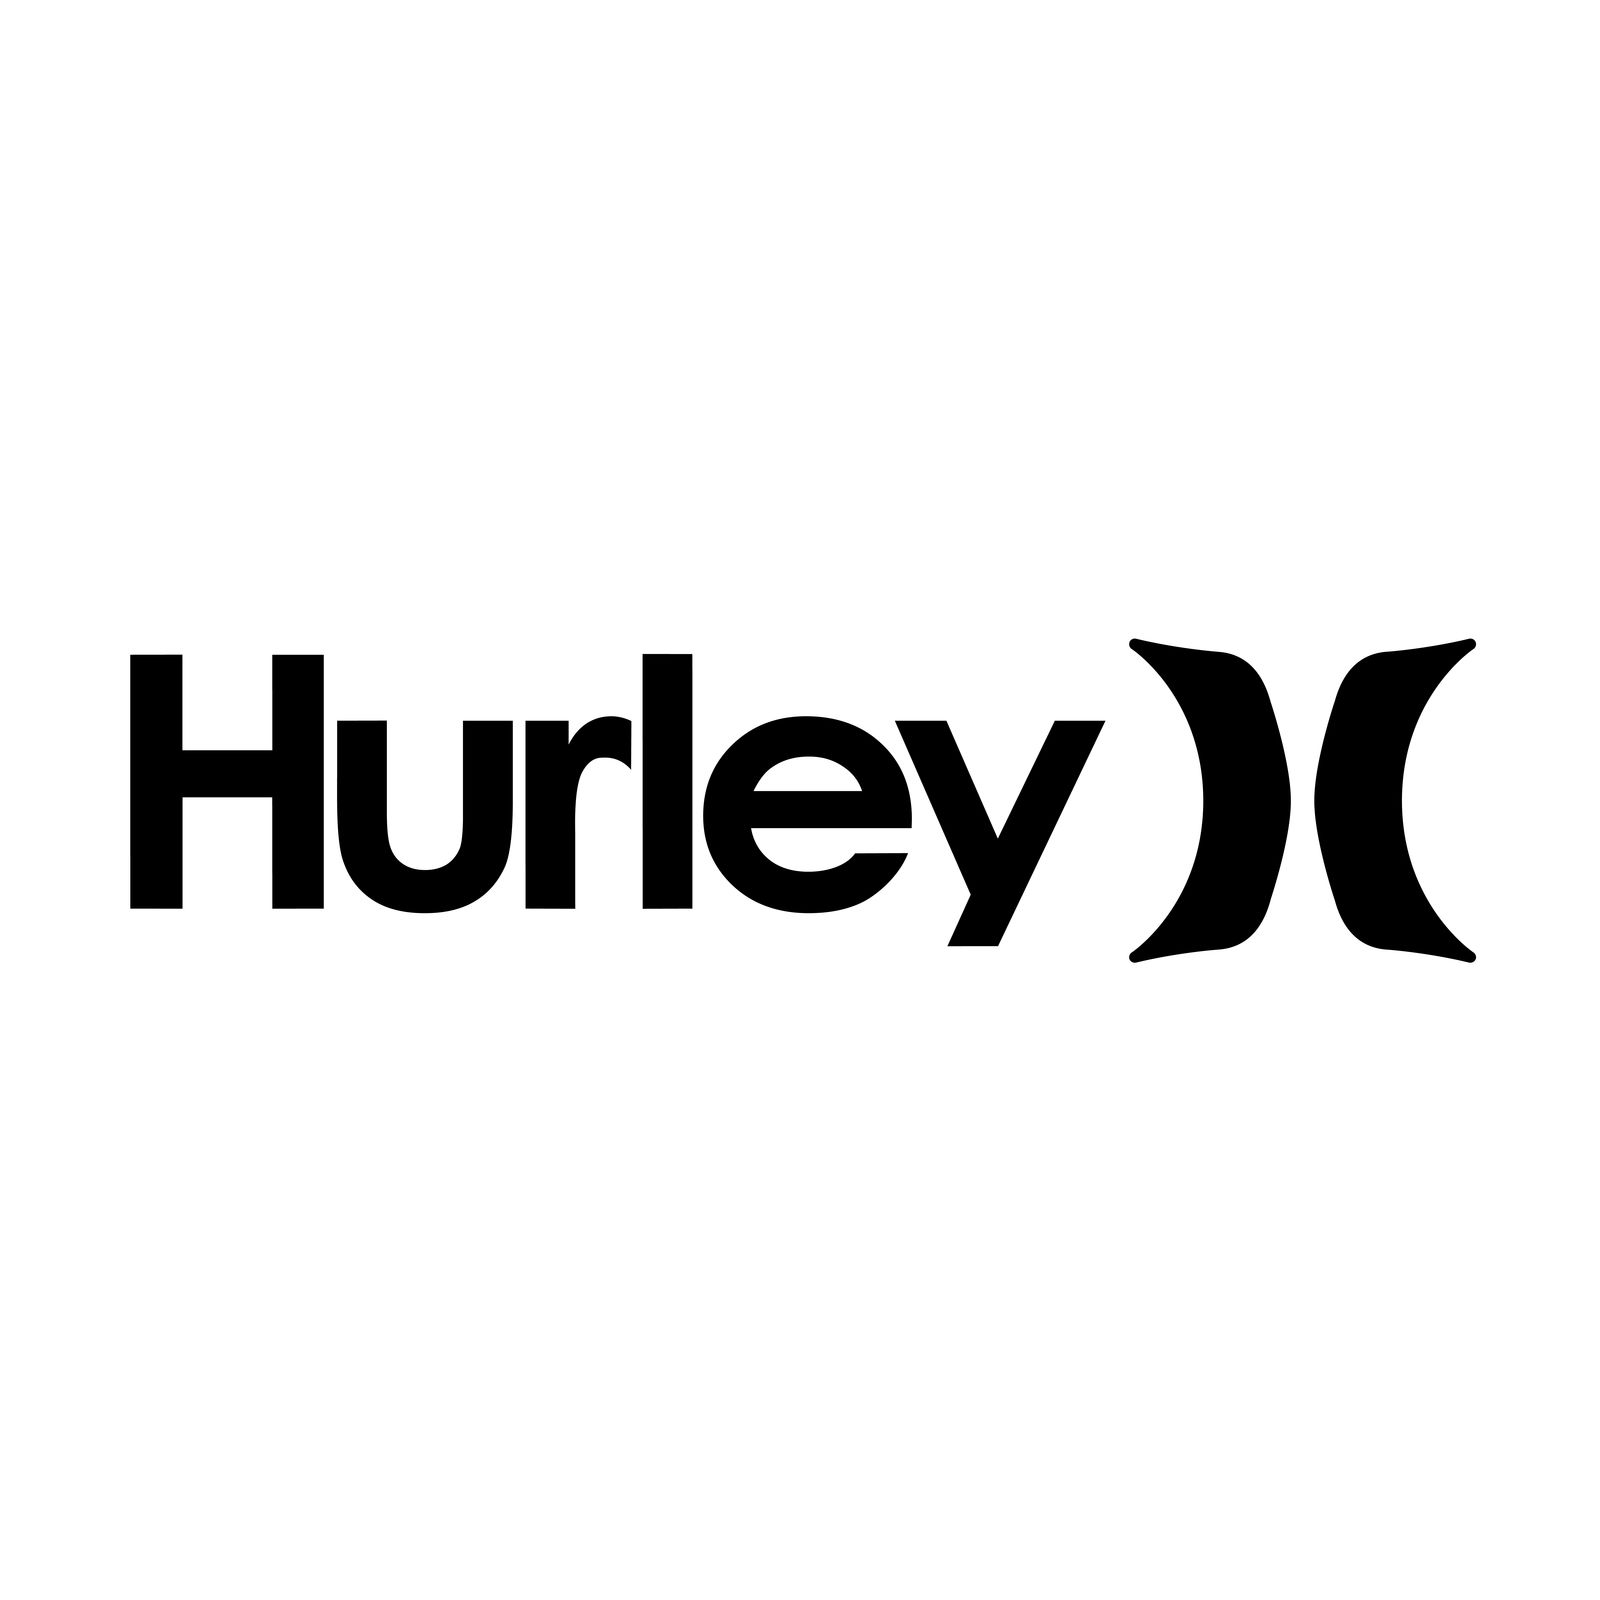 HURLEY (Bild 1)